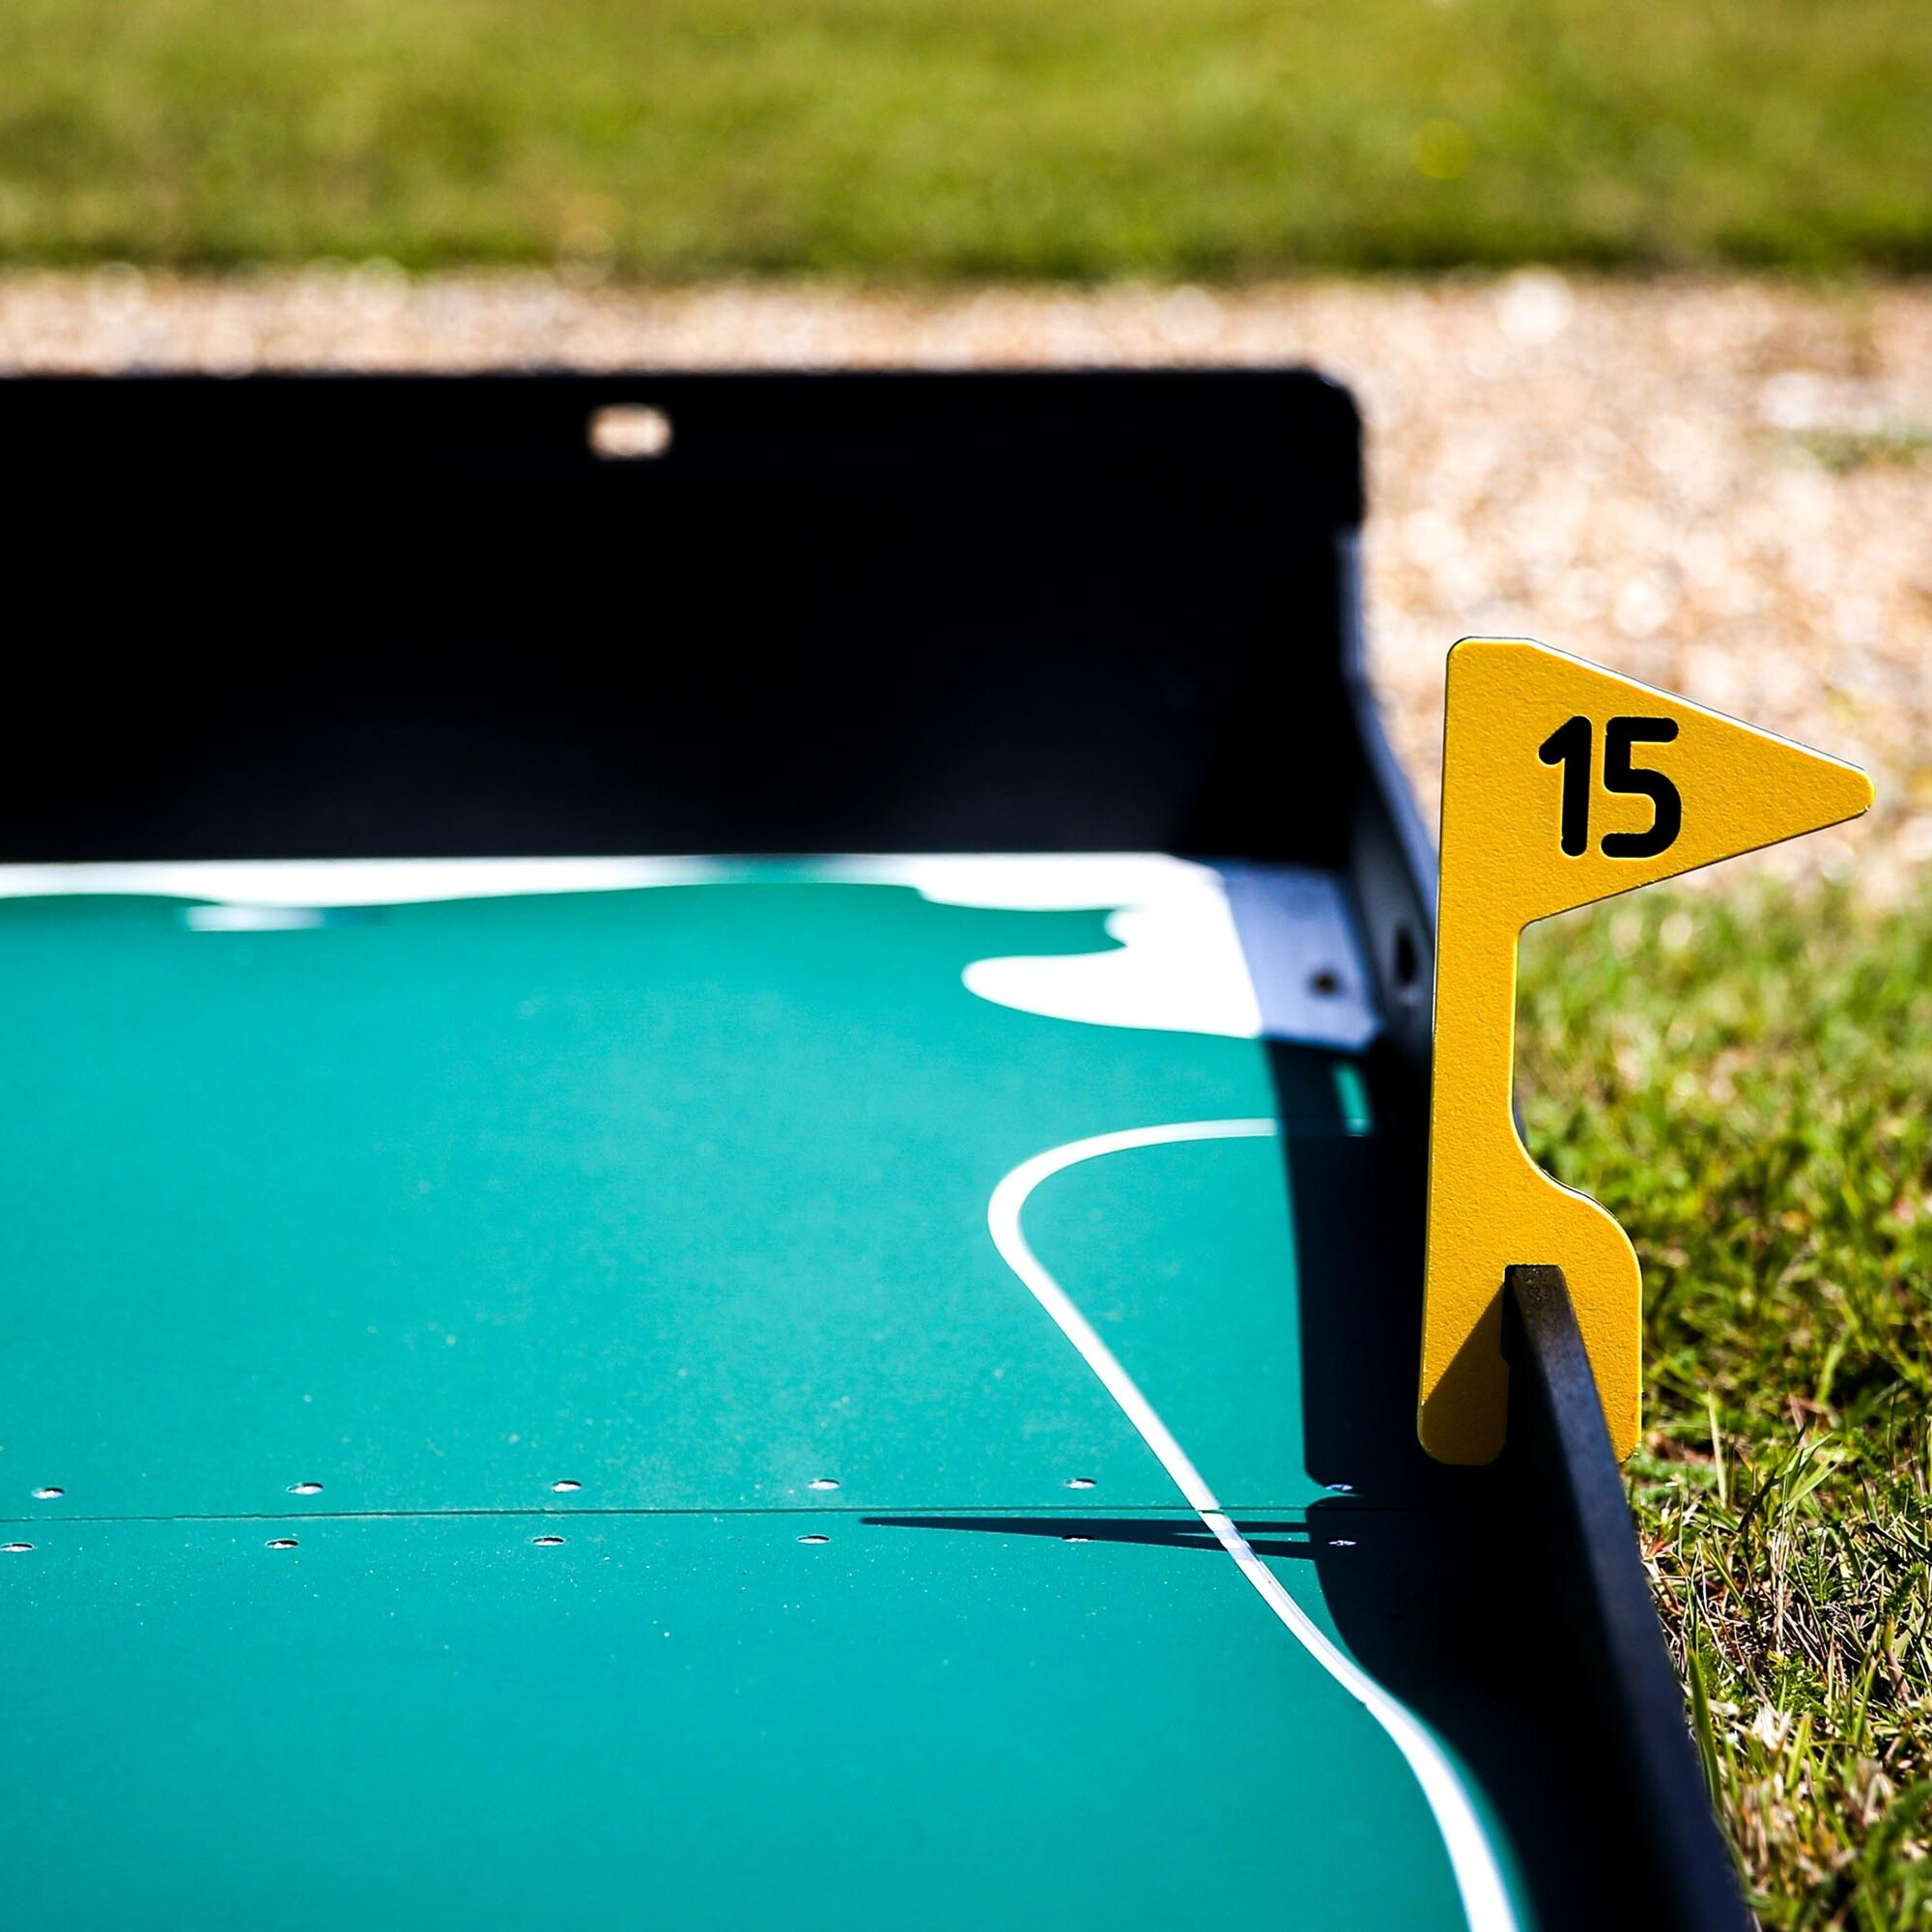 Crazy Golf Hire Hole 15 Fetcham